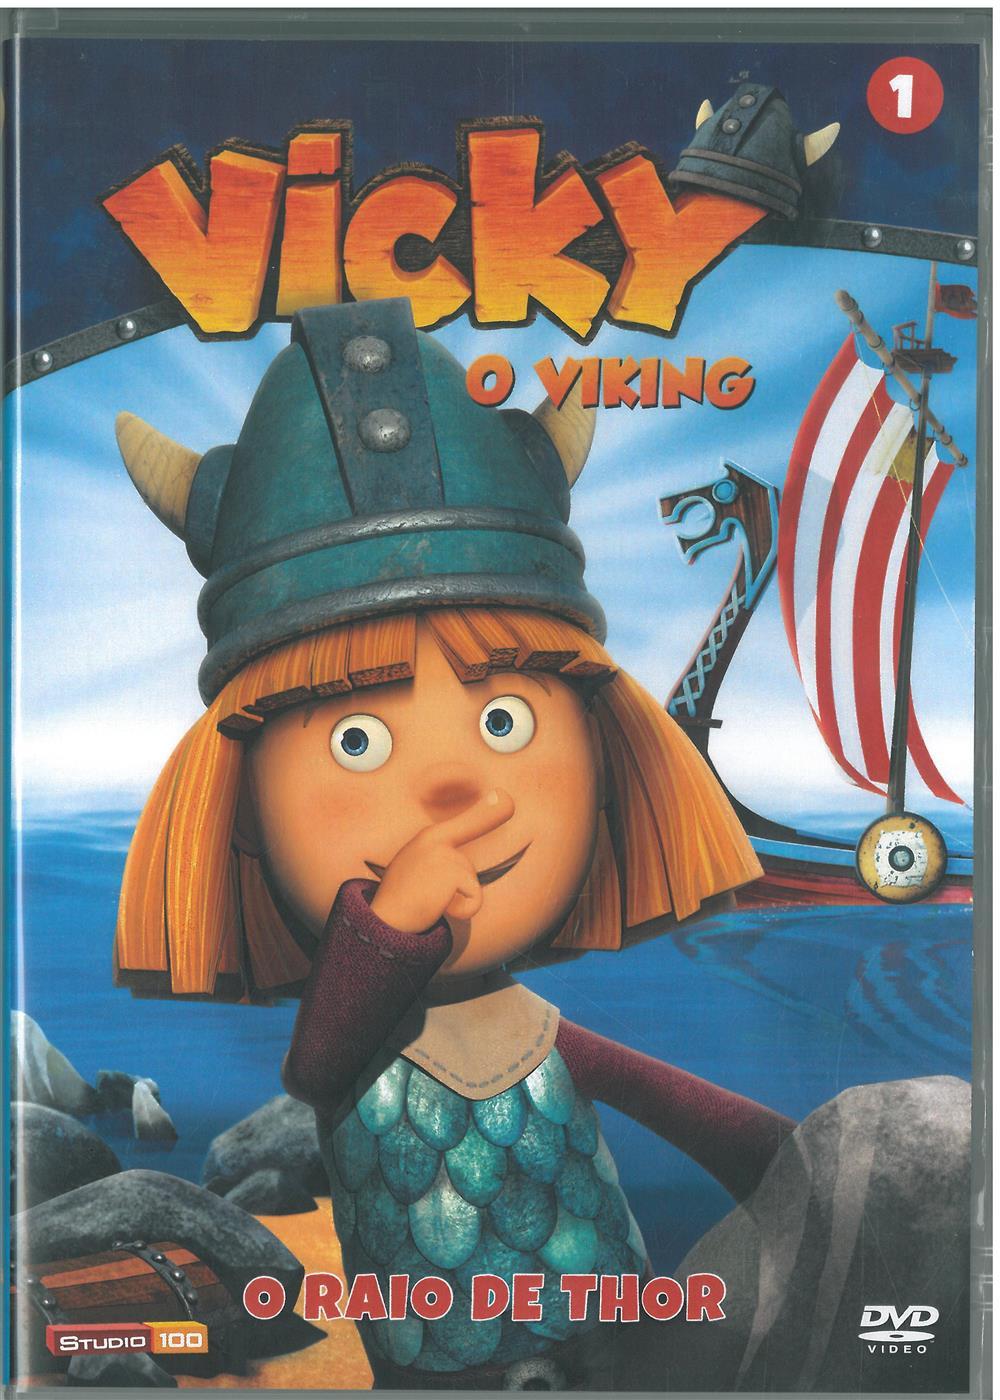 Vicky o viking 1_DVD.jpg